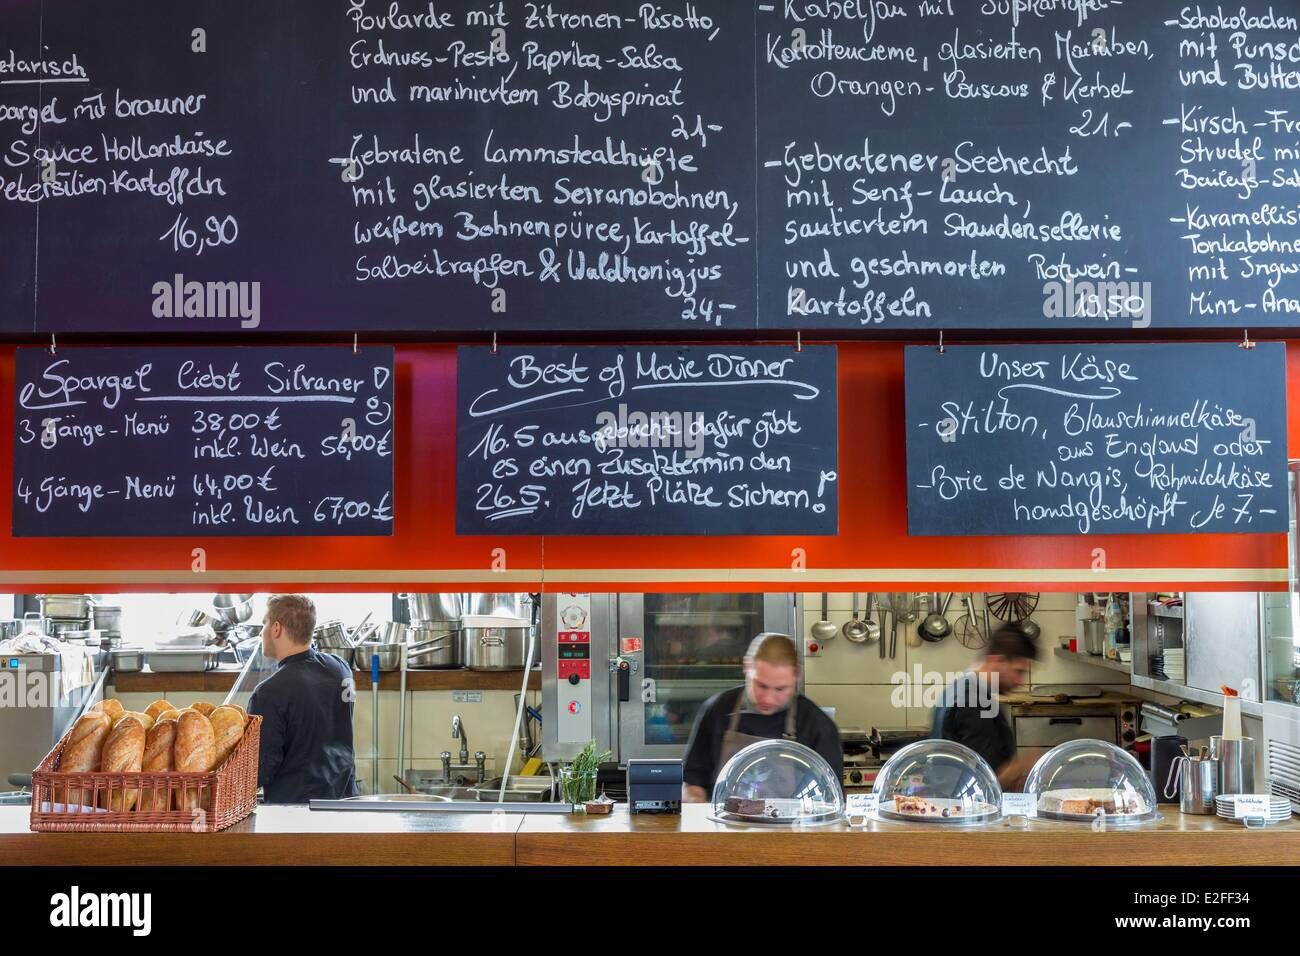 Germany, Hamburg, Deichtorhallen, Fillet of Soul restaurant - Stock Image